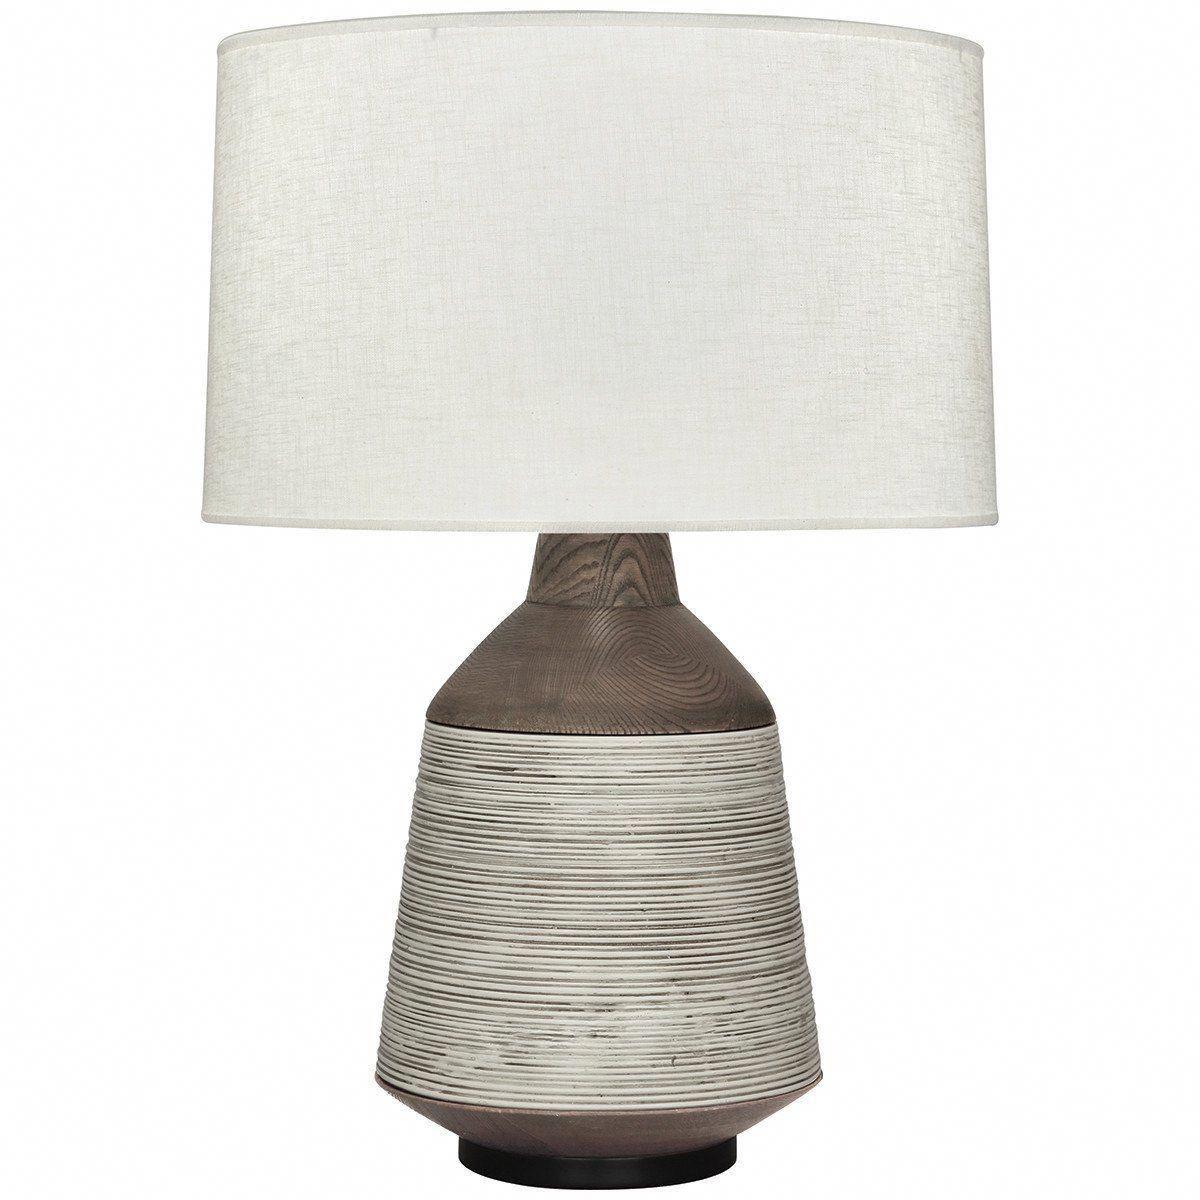 Robert Abbey Michael Berman Berkley Vessel Table Lamp Details